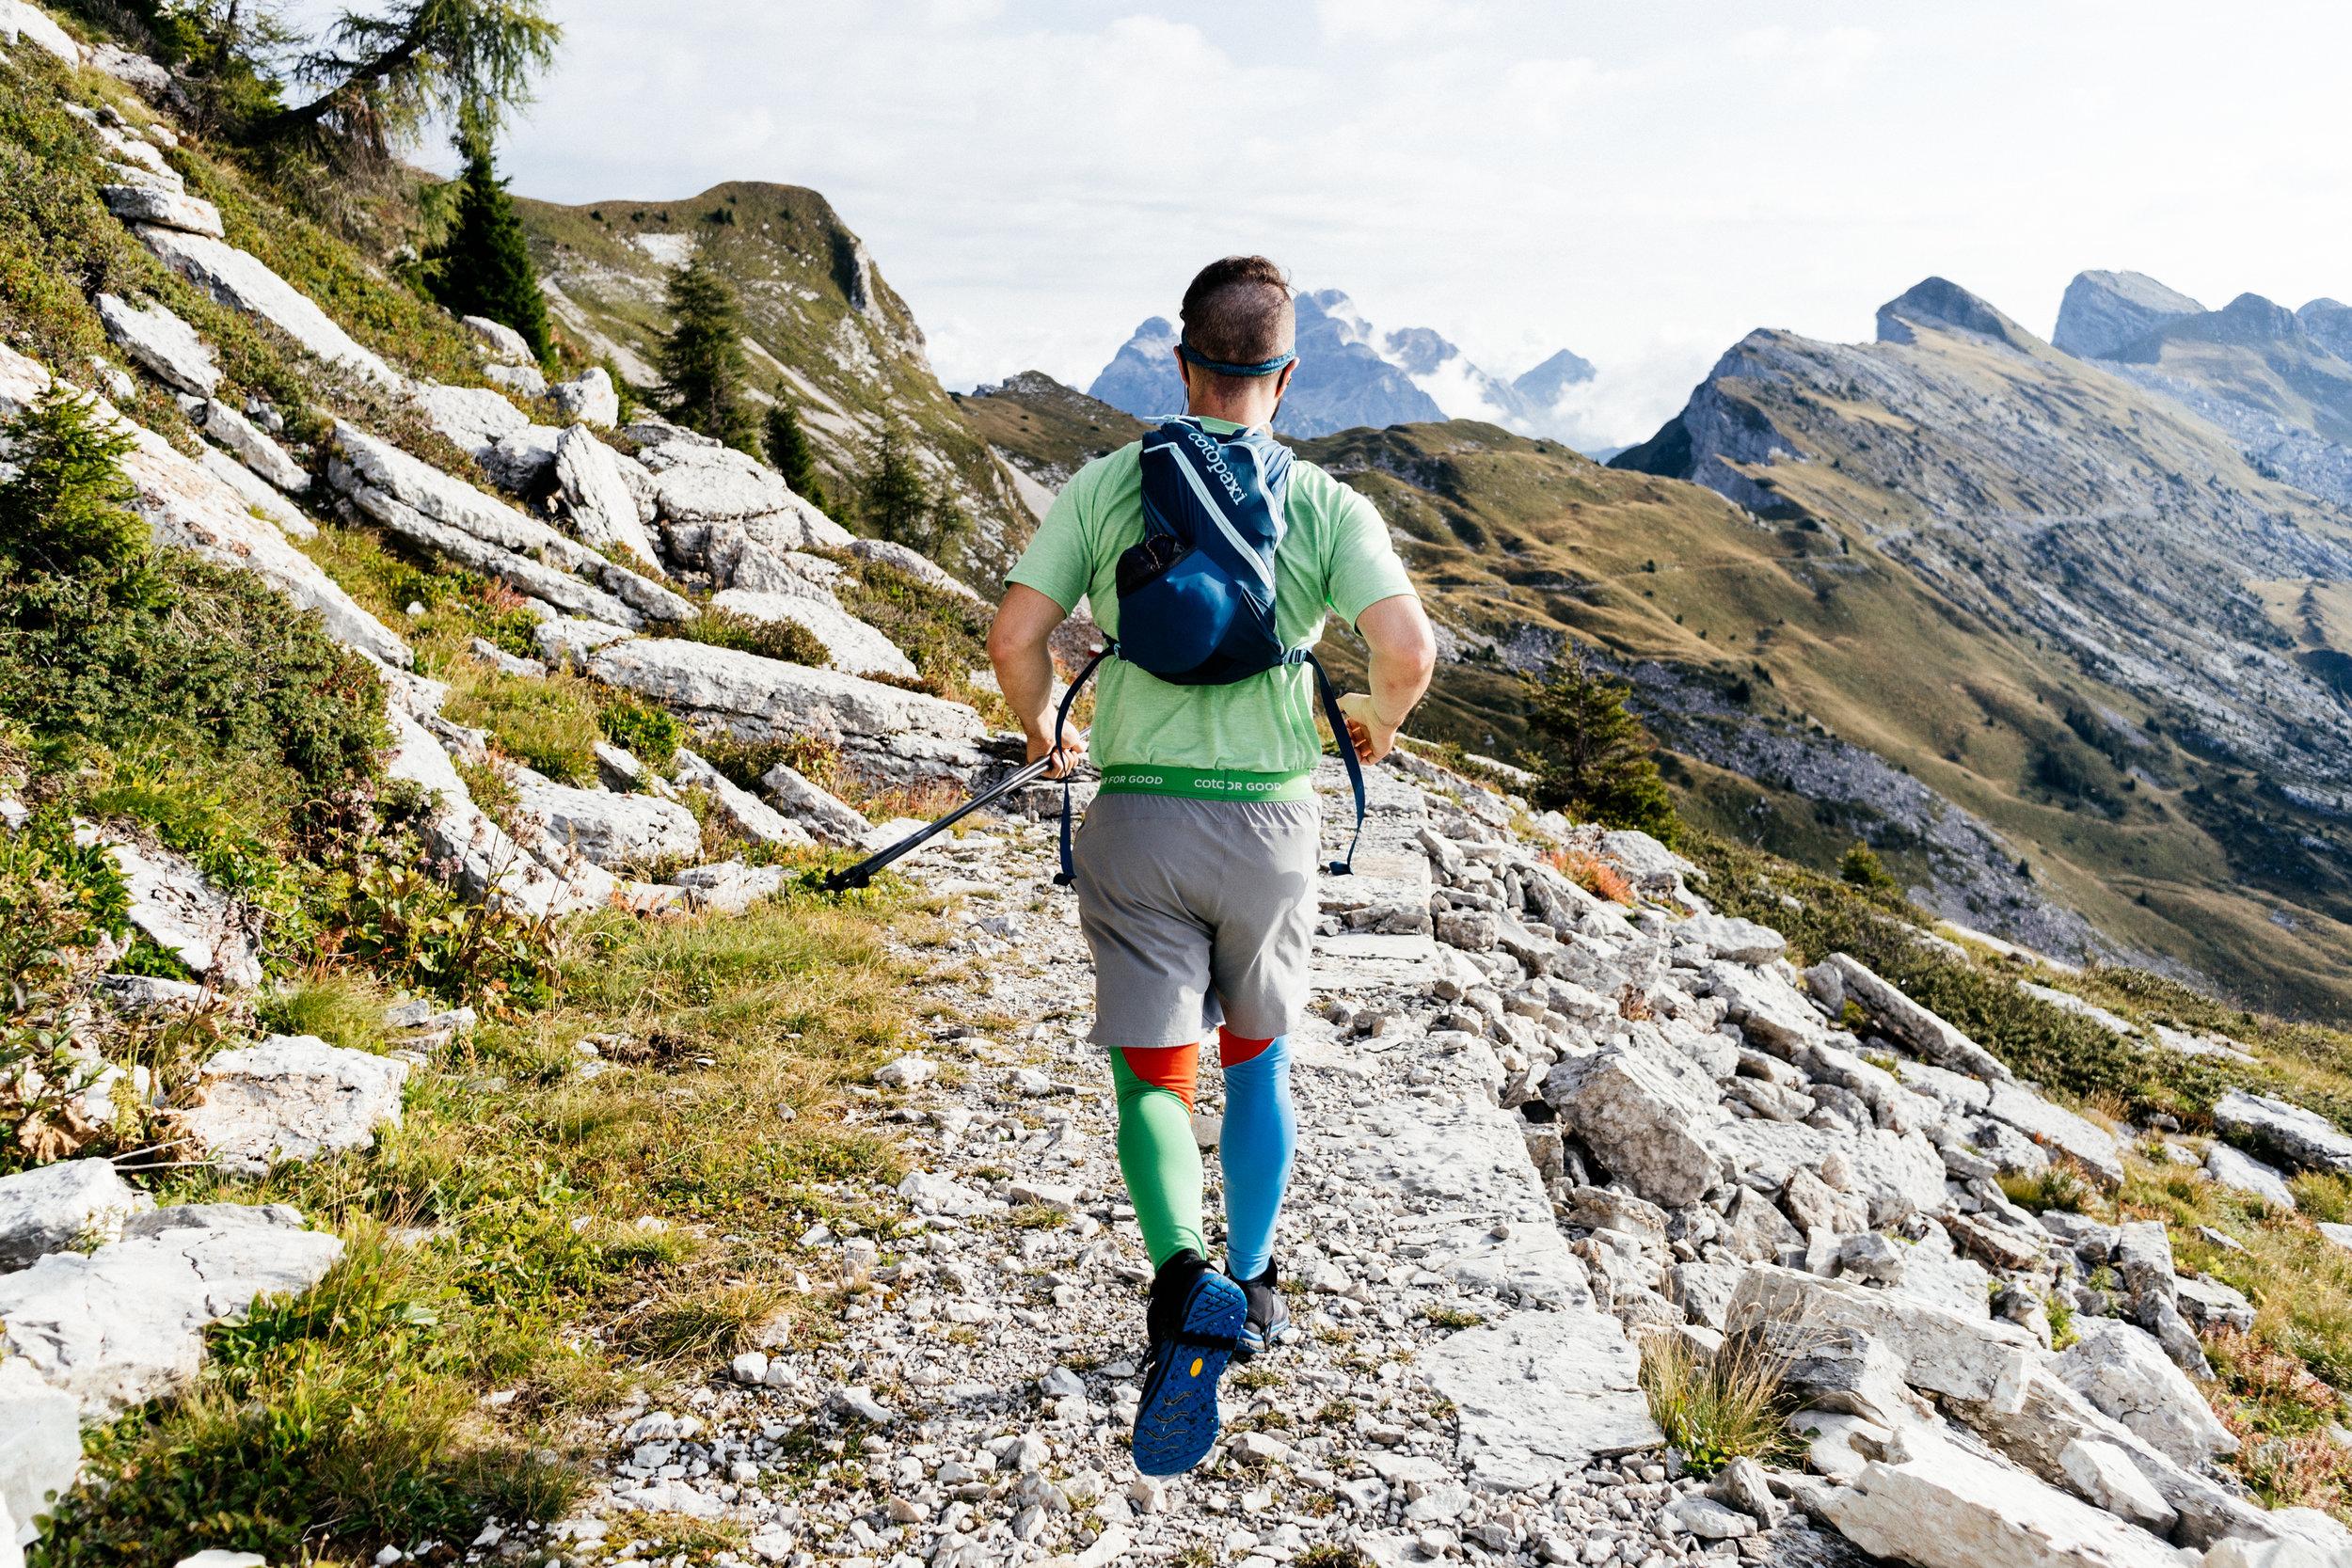 Dolomites-ChrisBrinleeJr-SEP17-8.jpg